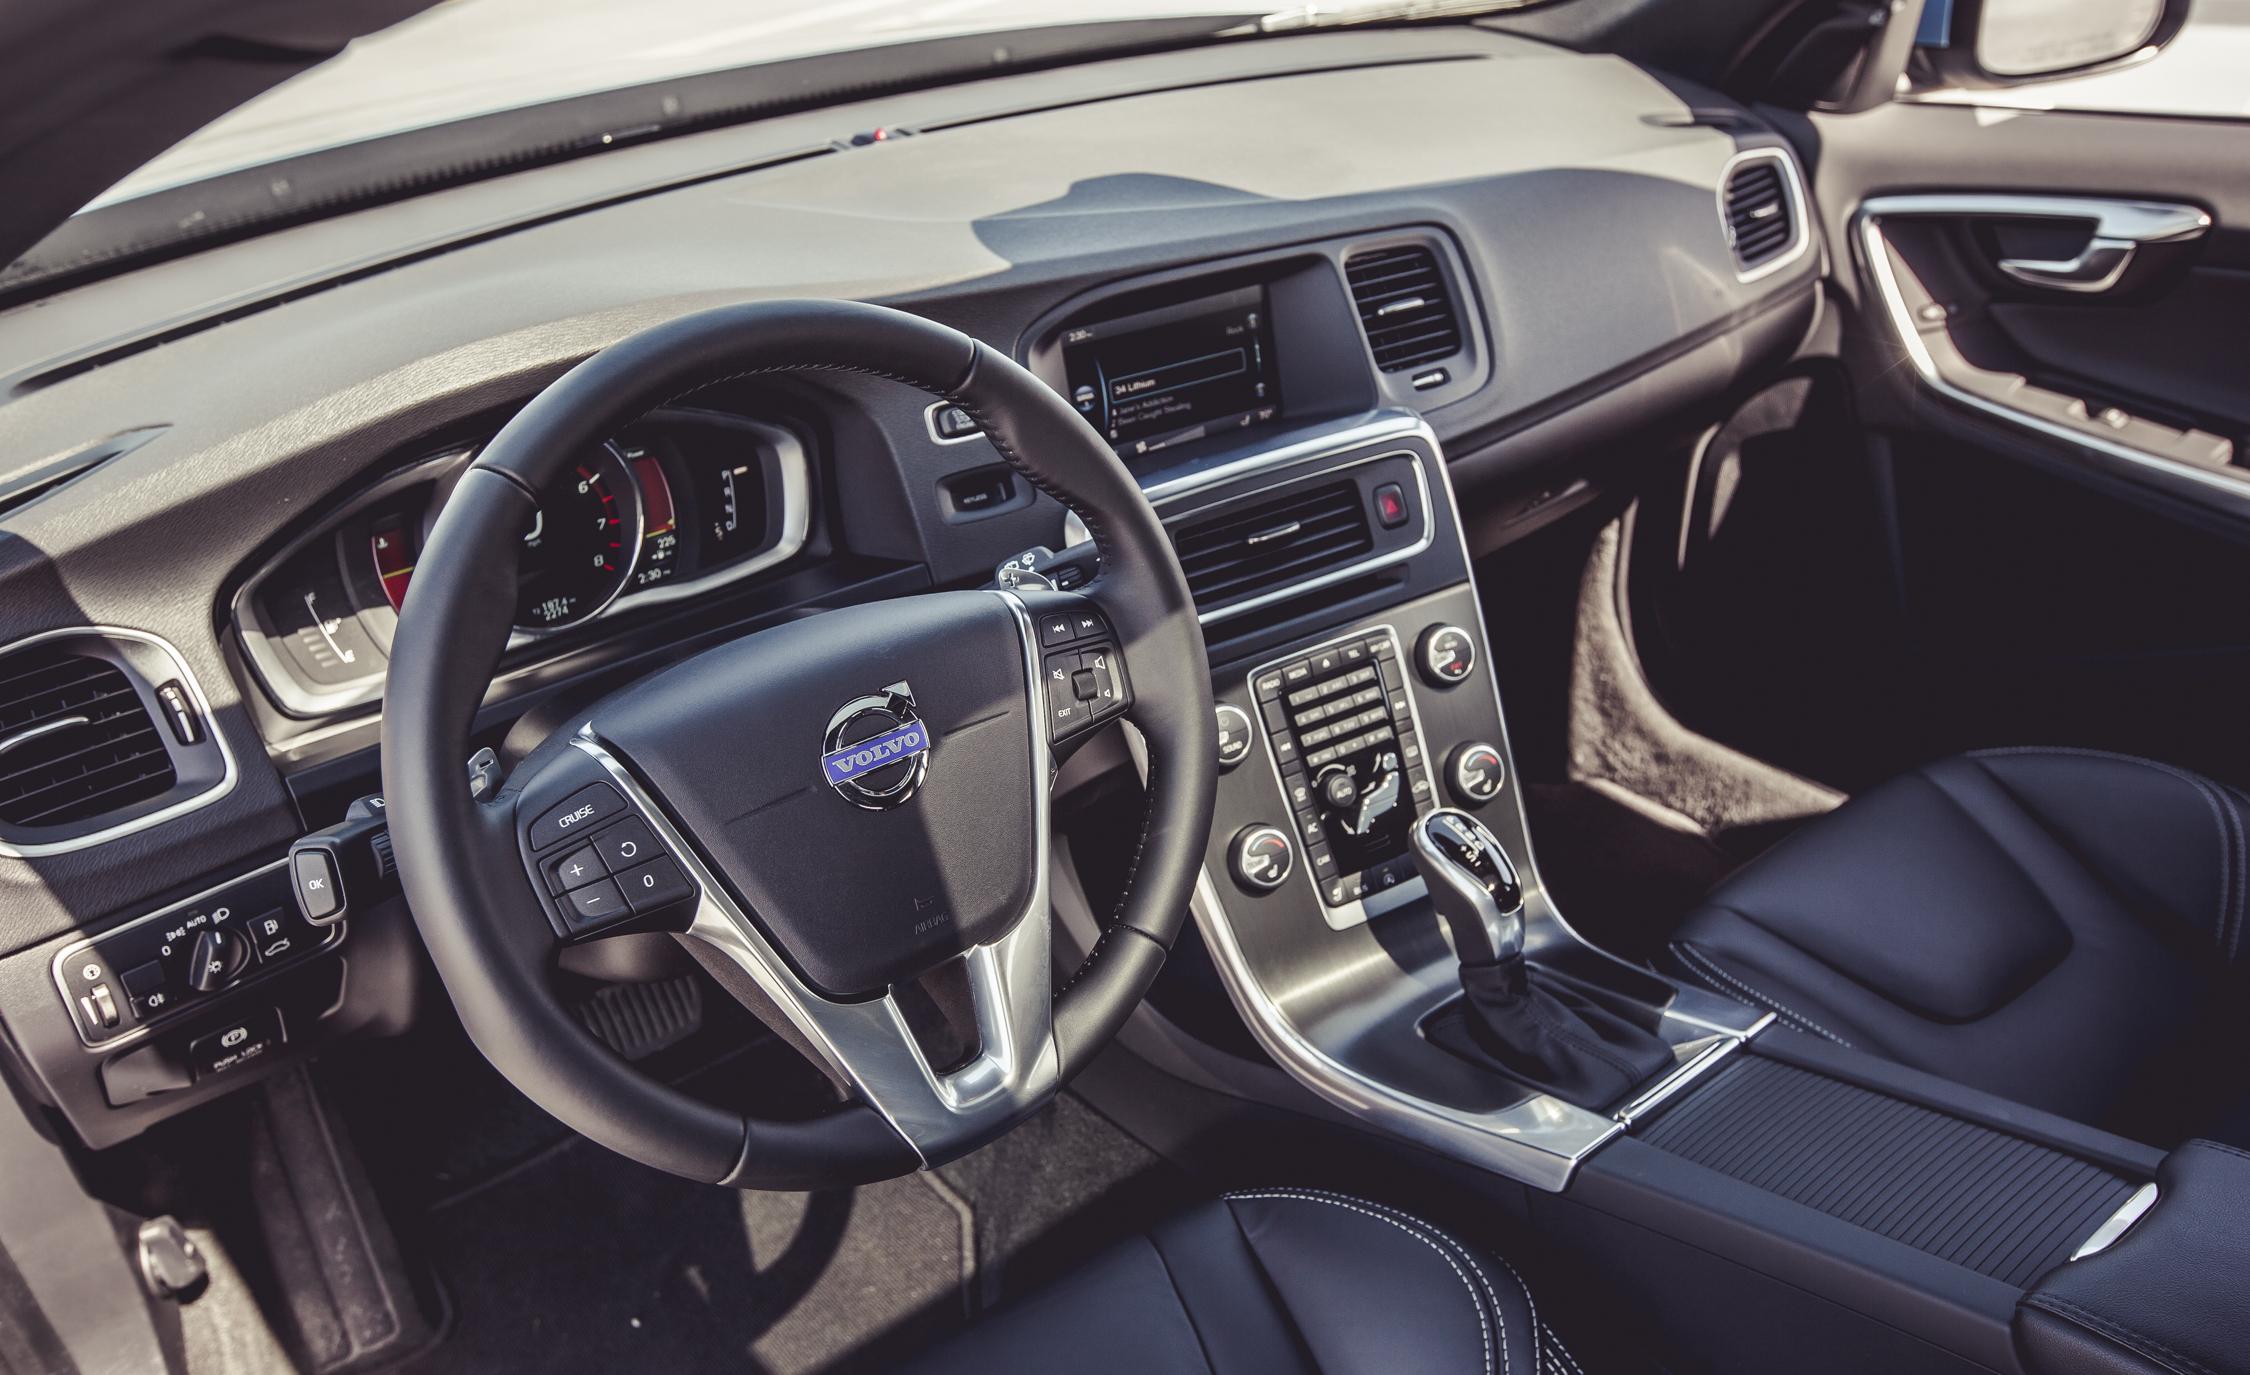 2015 Volvo V60 Interior Front